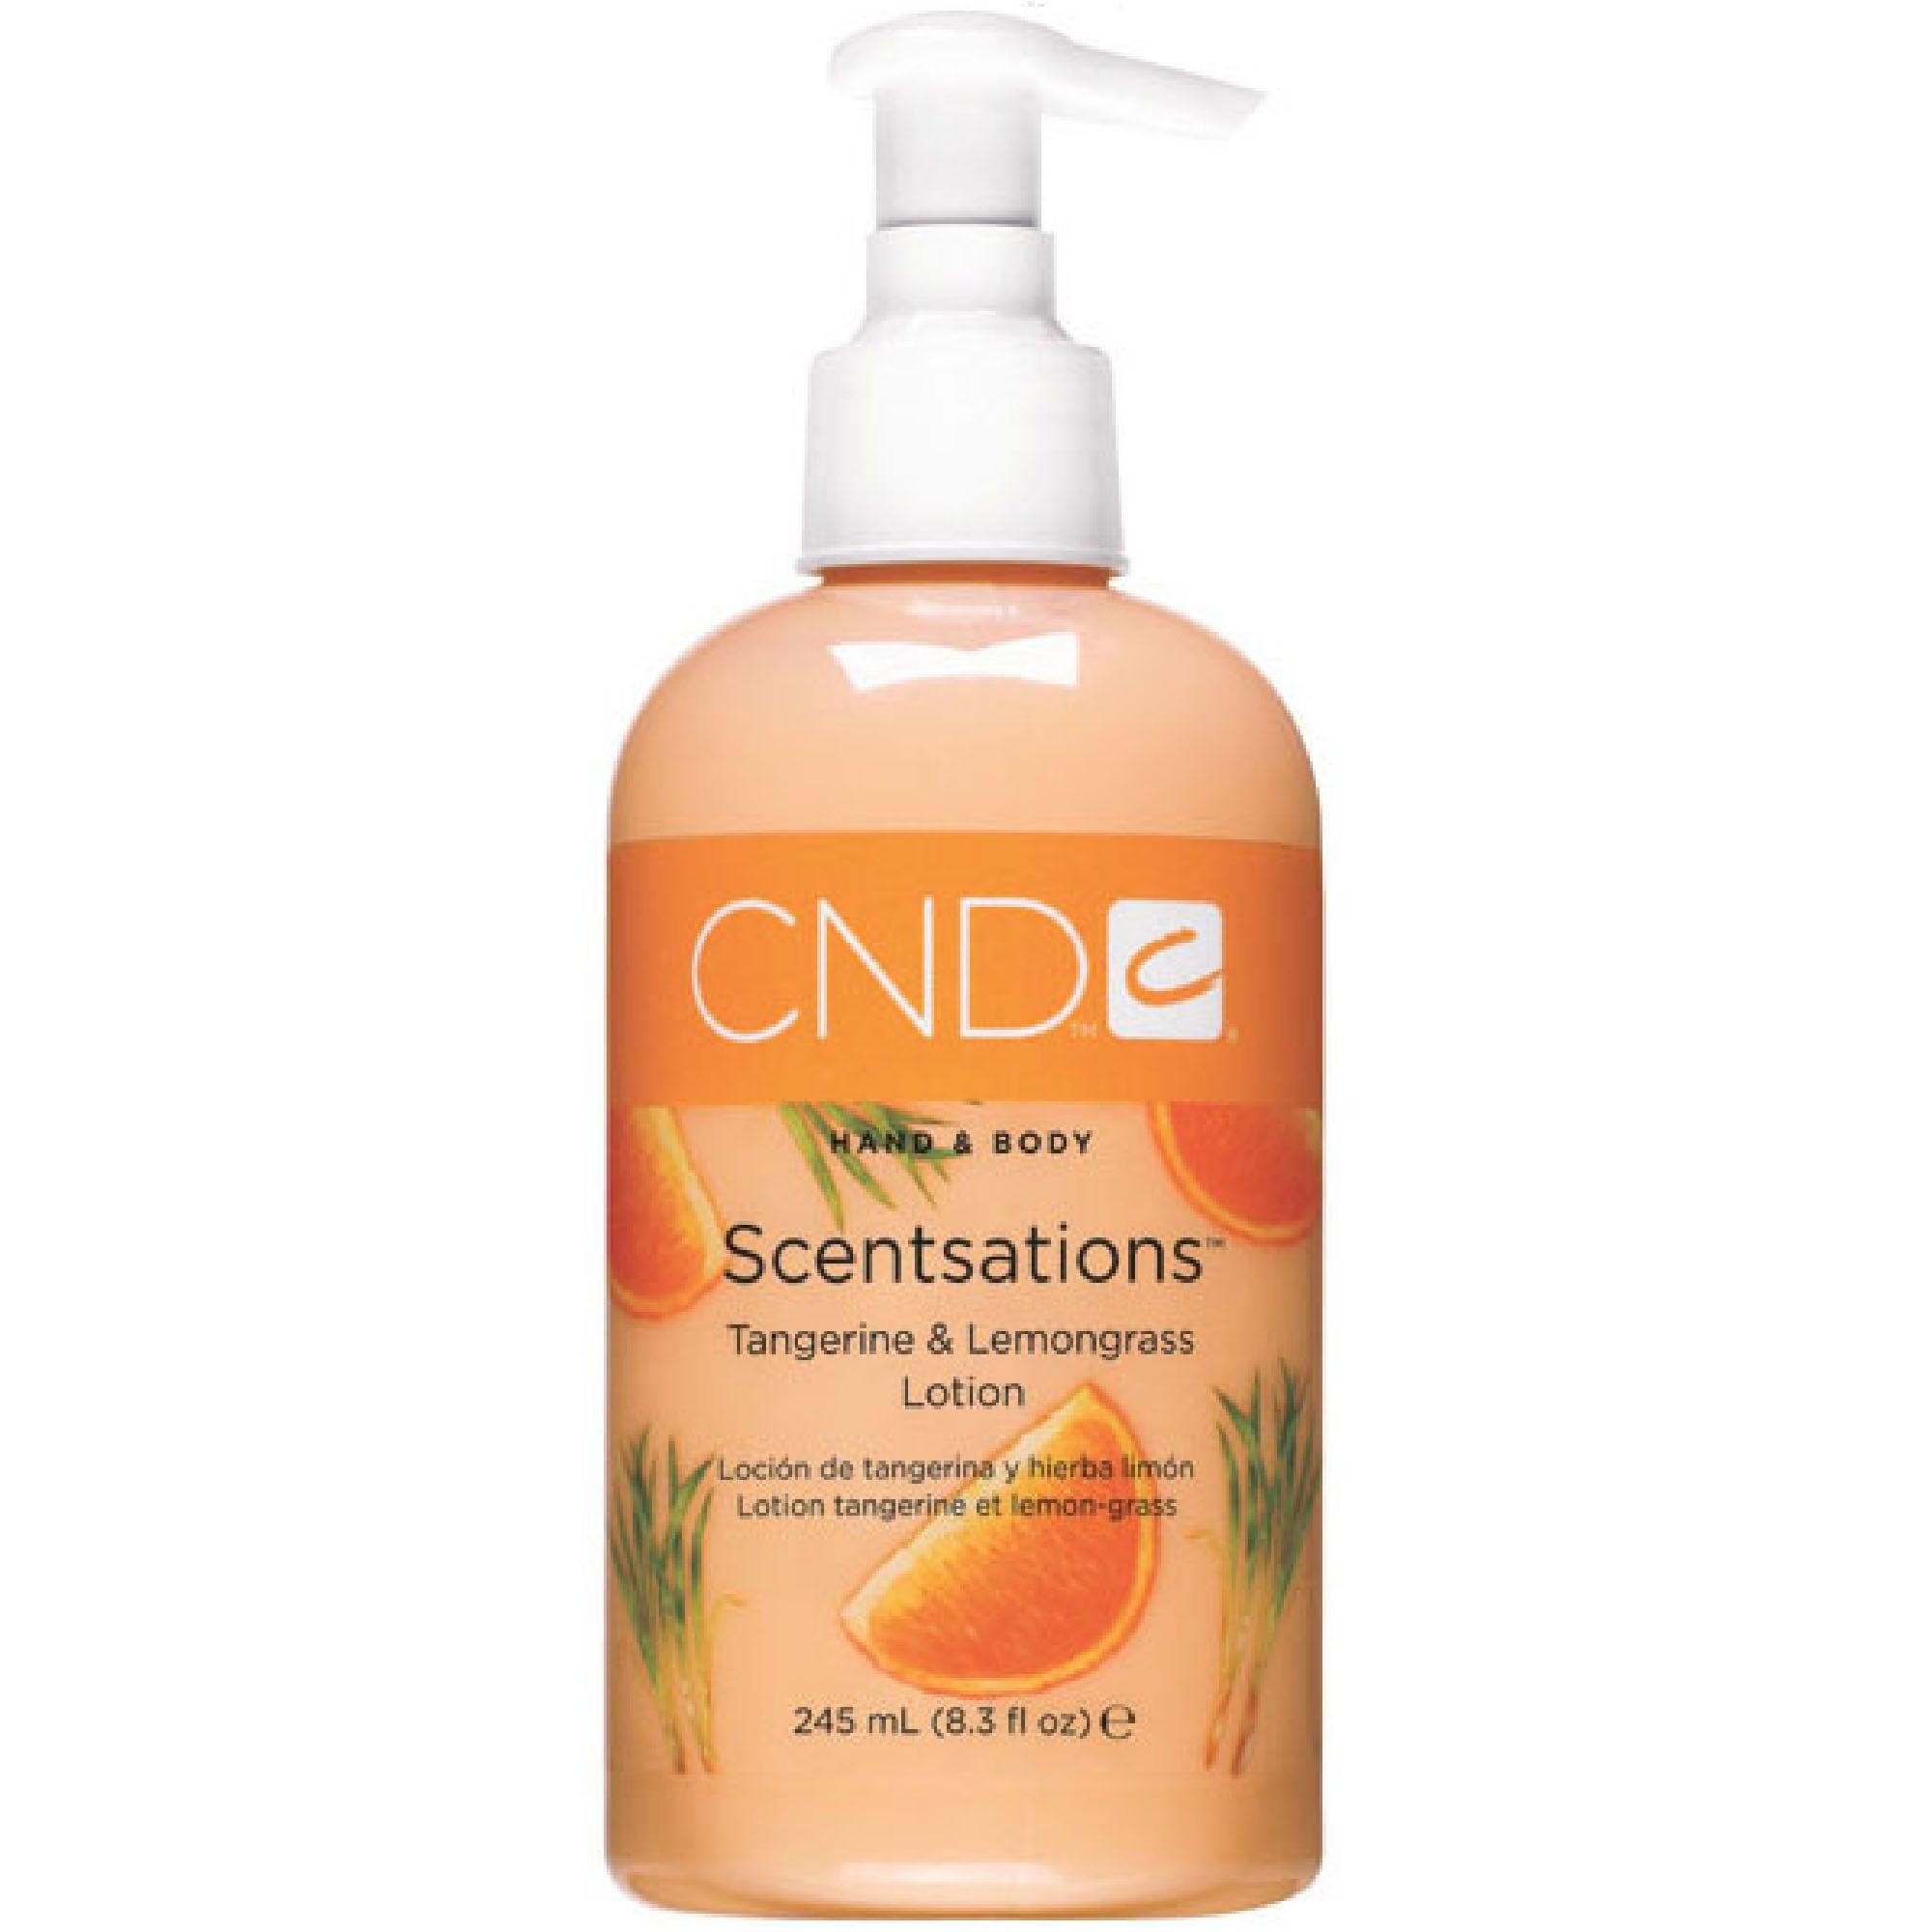 Afbeelding van CND ™ Scentsations Lotion - Tangerine & Lemongrass 245 ml